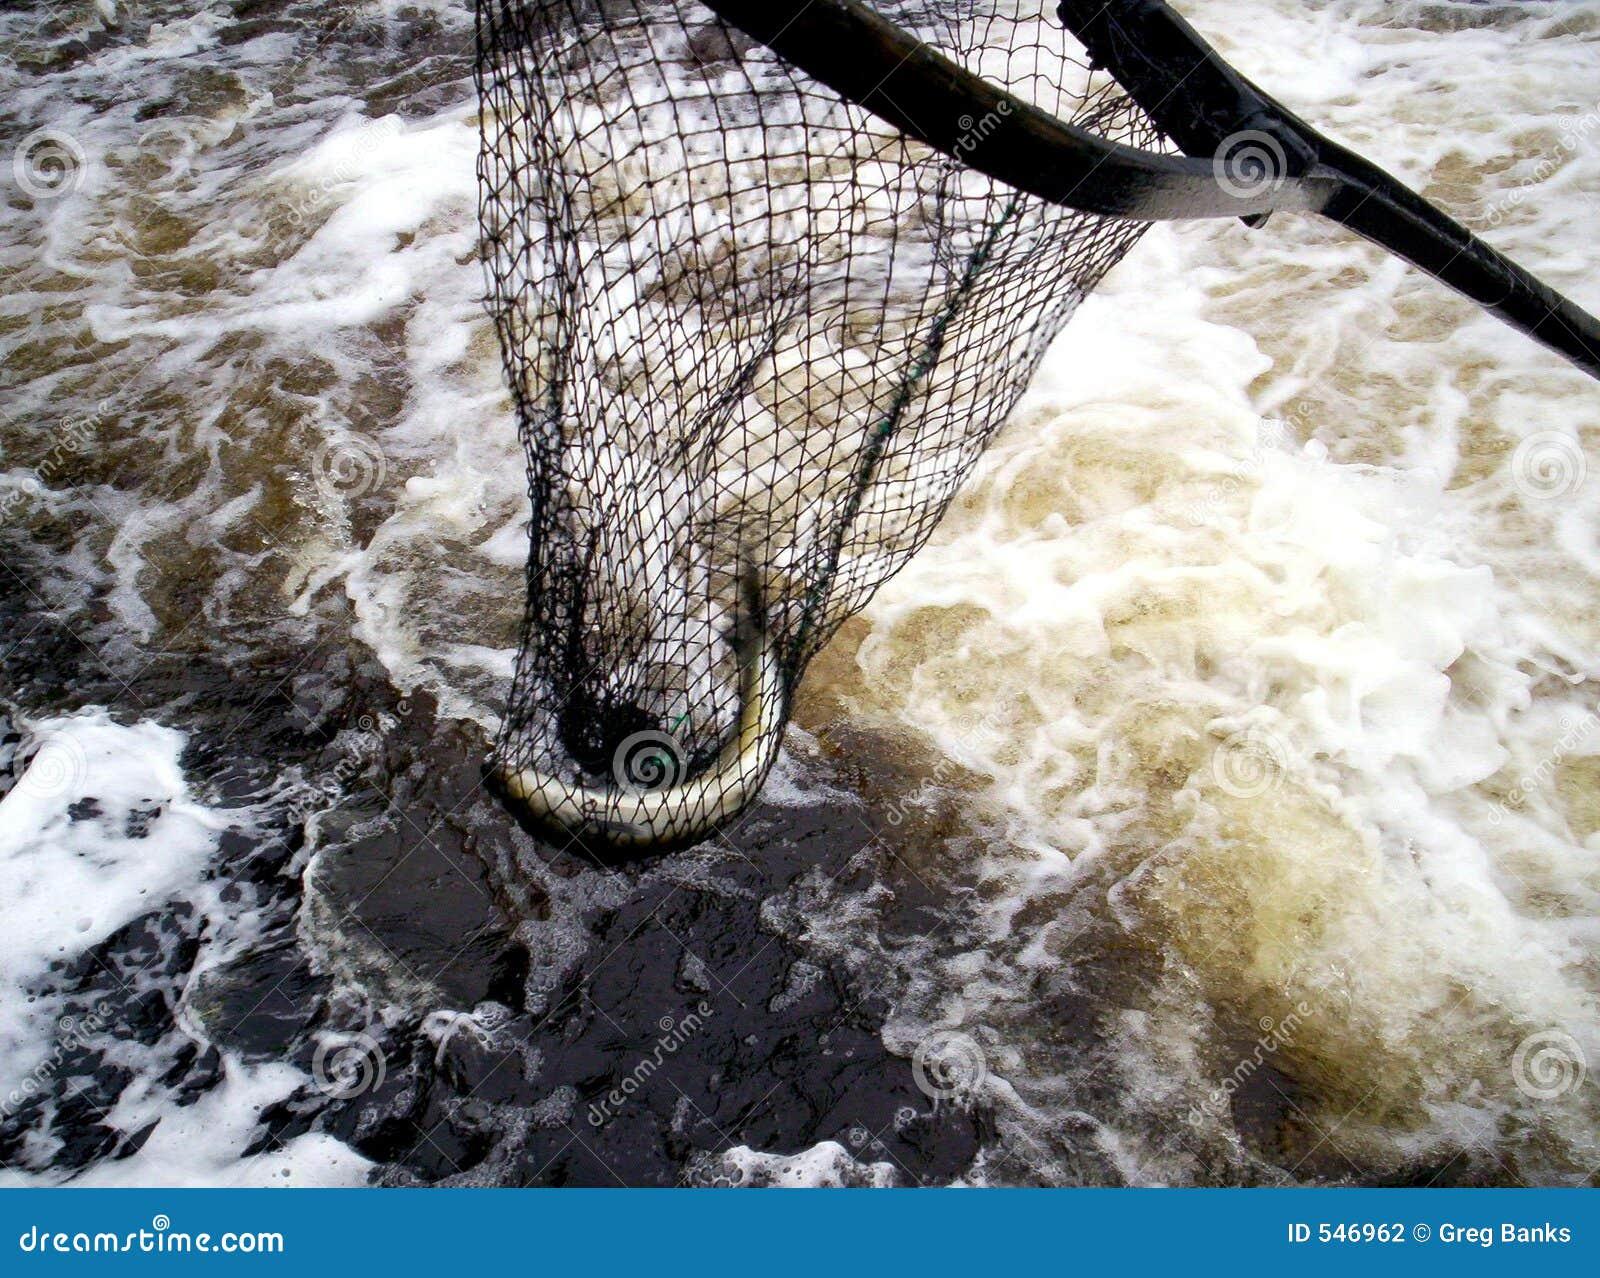 Download Dipnet鱼 库存照片. 图片 包括有 提供, 本质, 工作者, 浸洗, 工作, 商业, 瀑布, 行业, 职业 - 546962